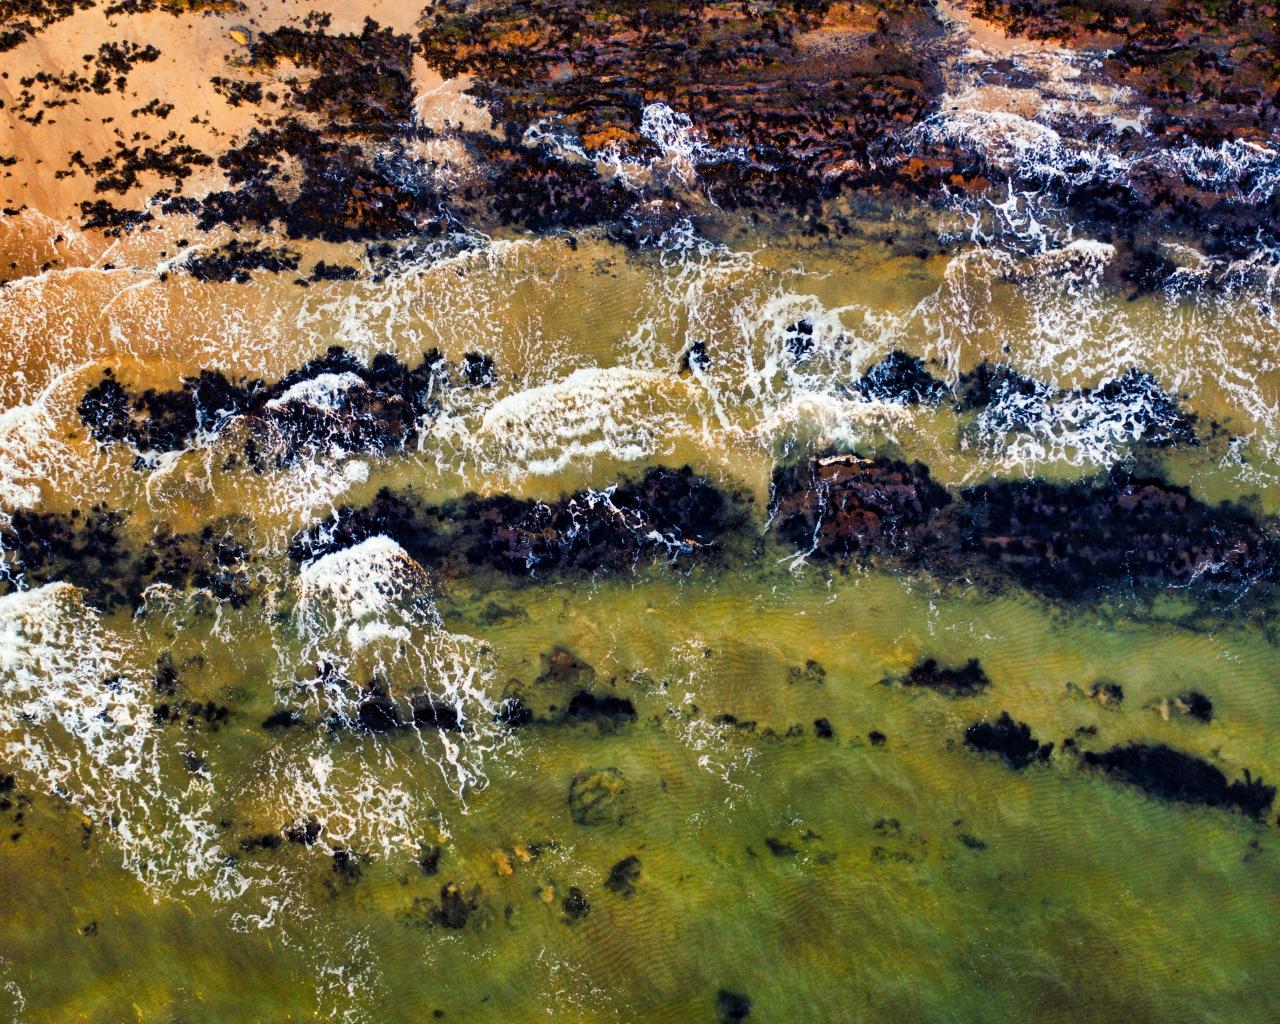 Green, body of water, waves, coast, 1280x1024 wallpaper